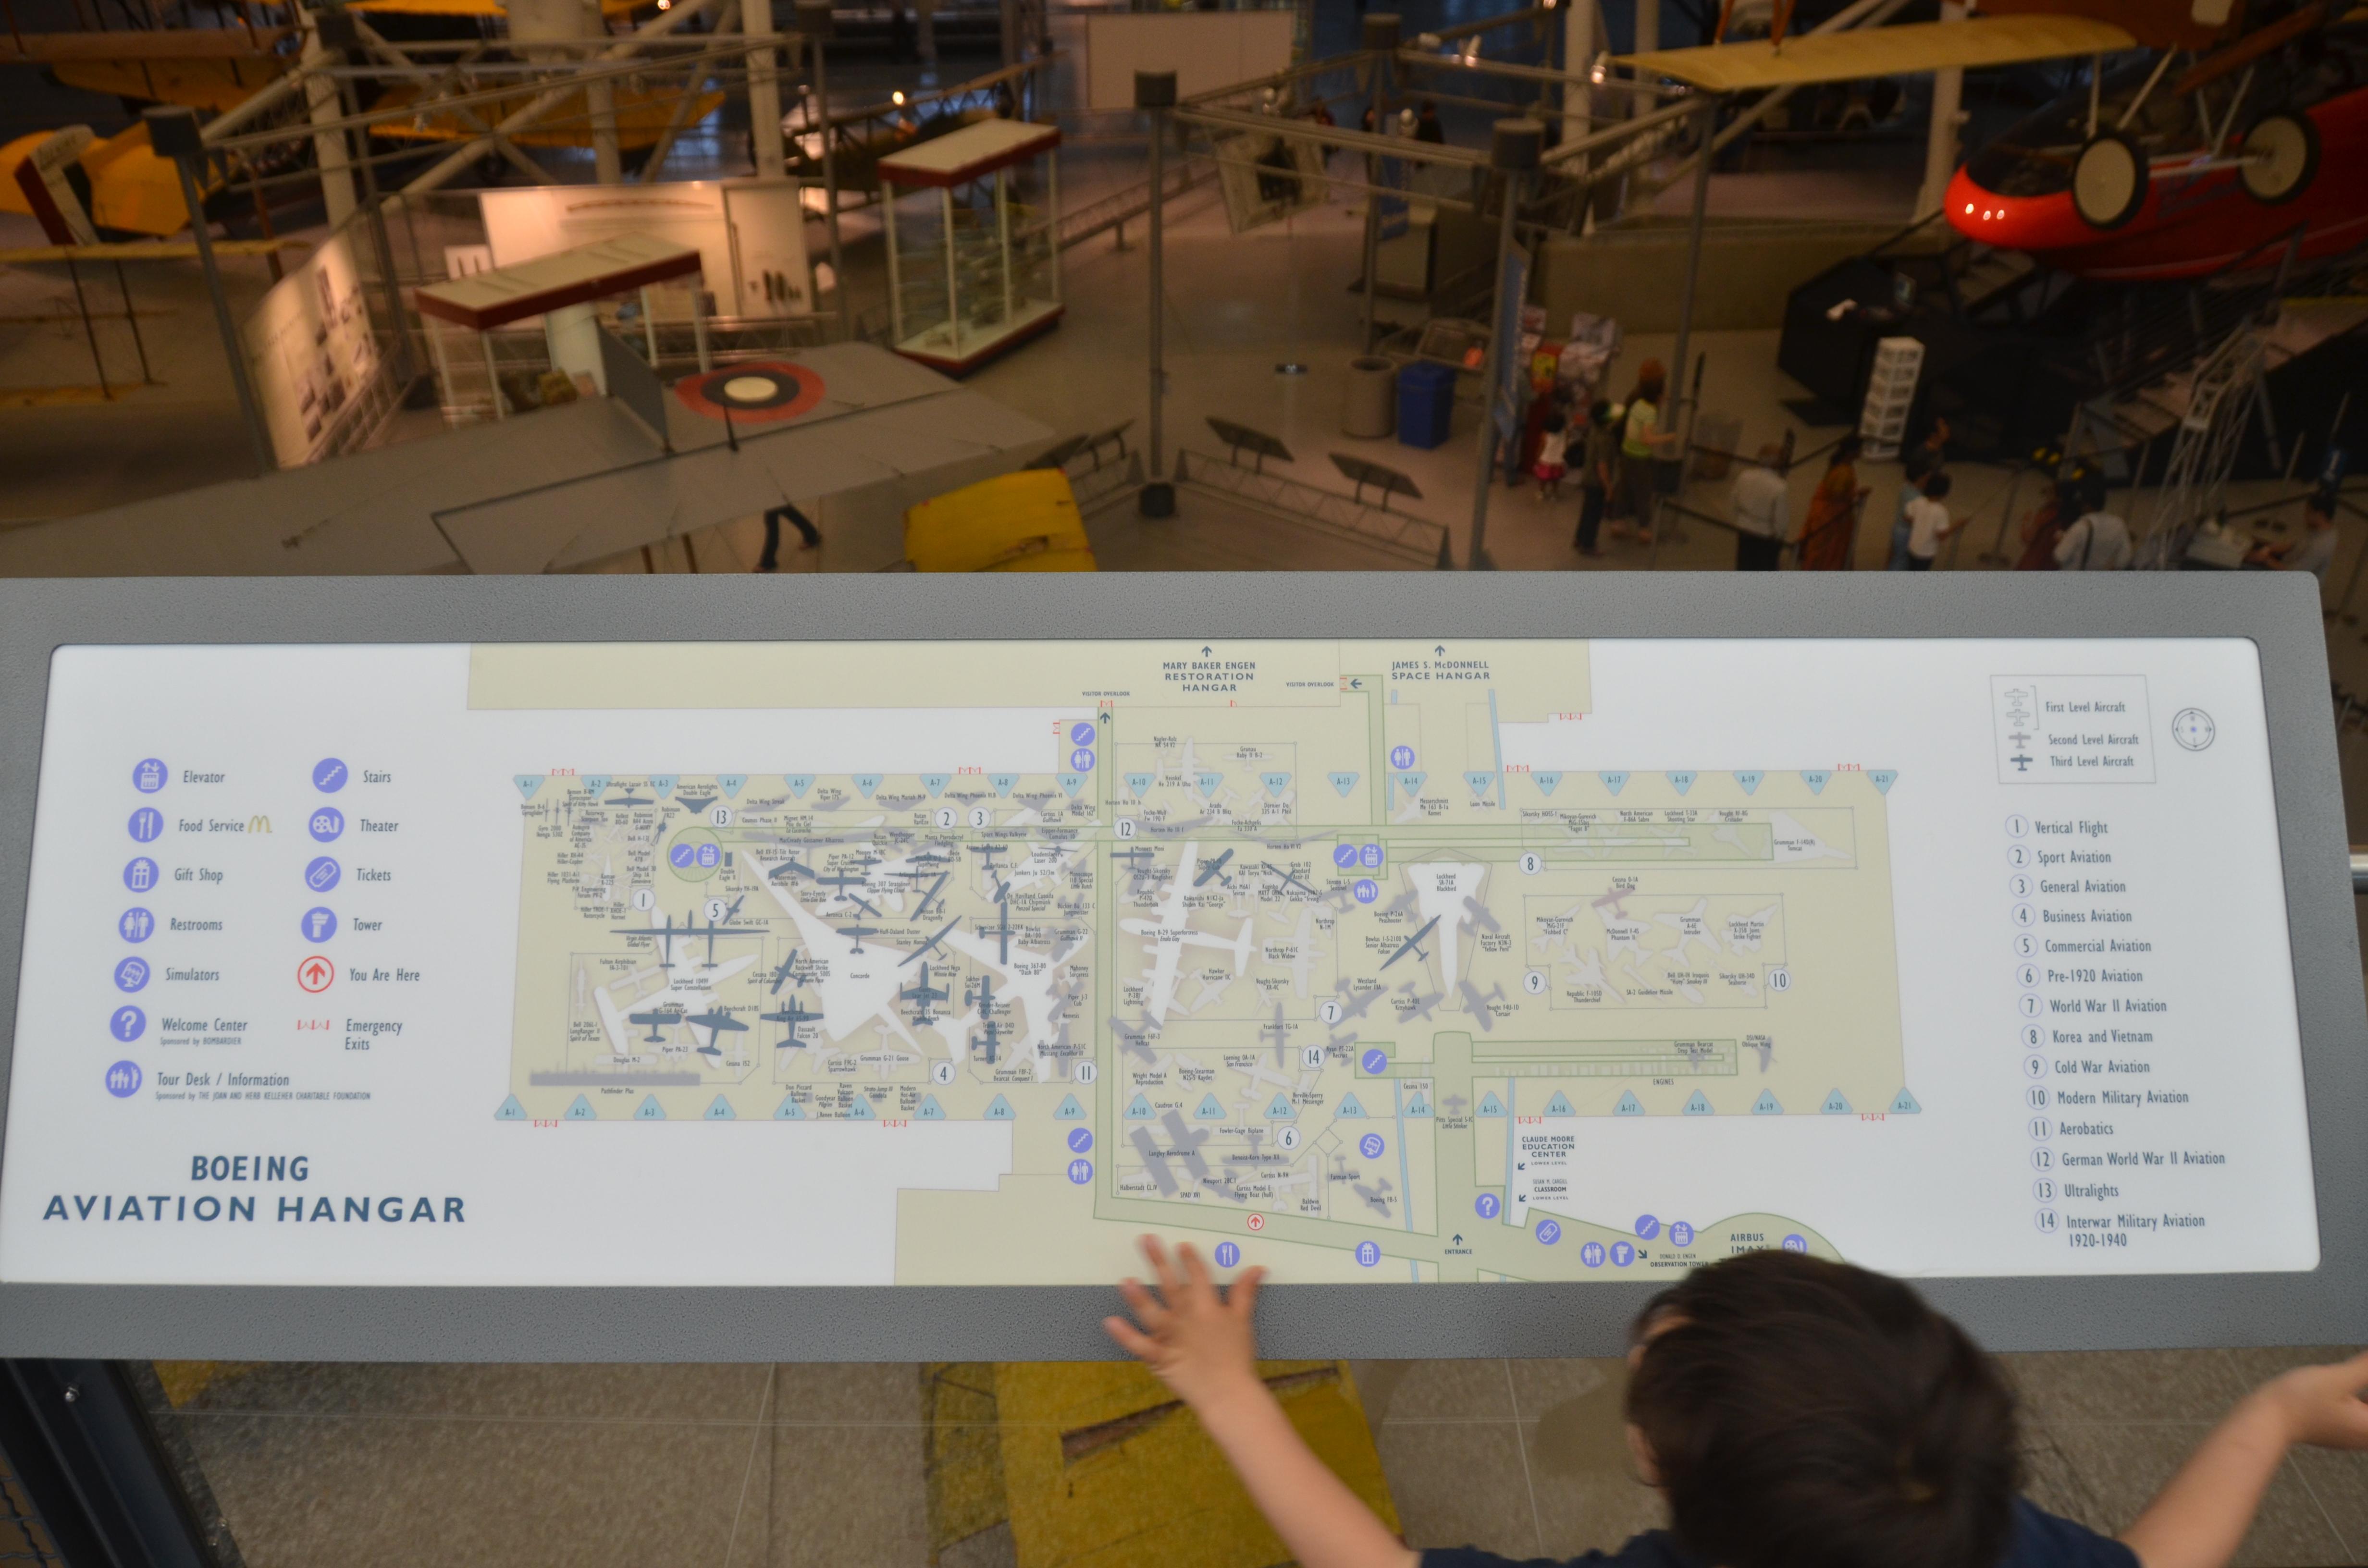 Steven F. Udvar-Hazy Center: map of the museum